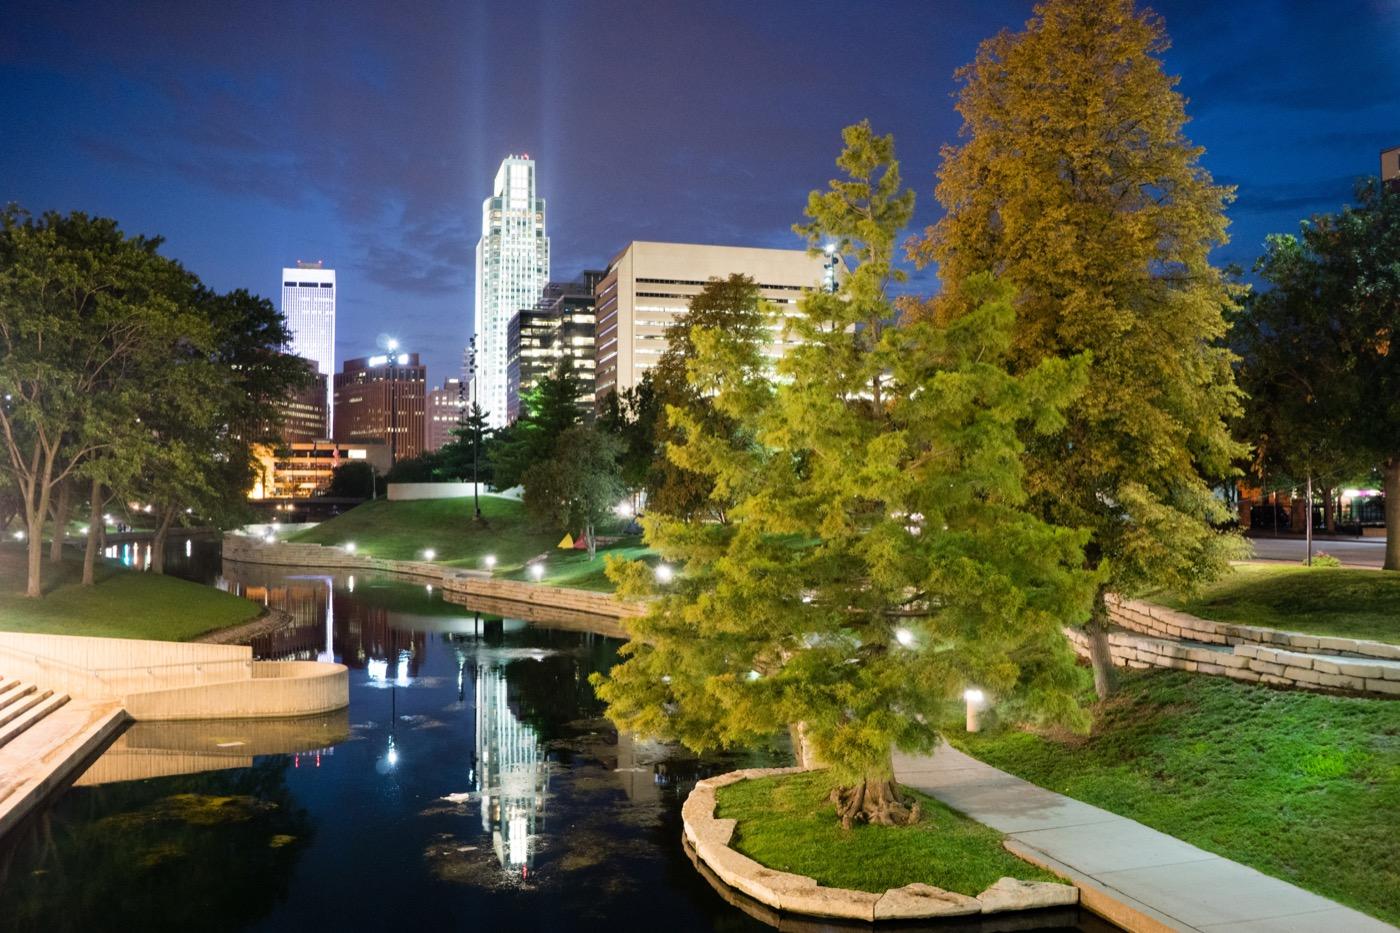 Omaha Nebraska Downtown City Park Skyline Dusk Night